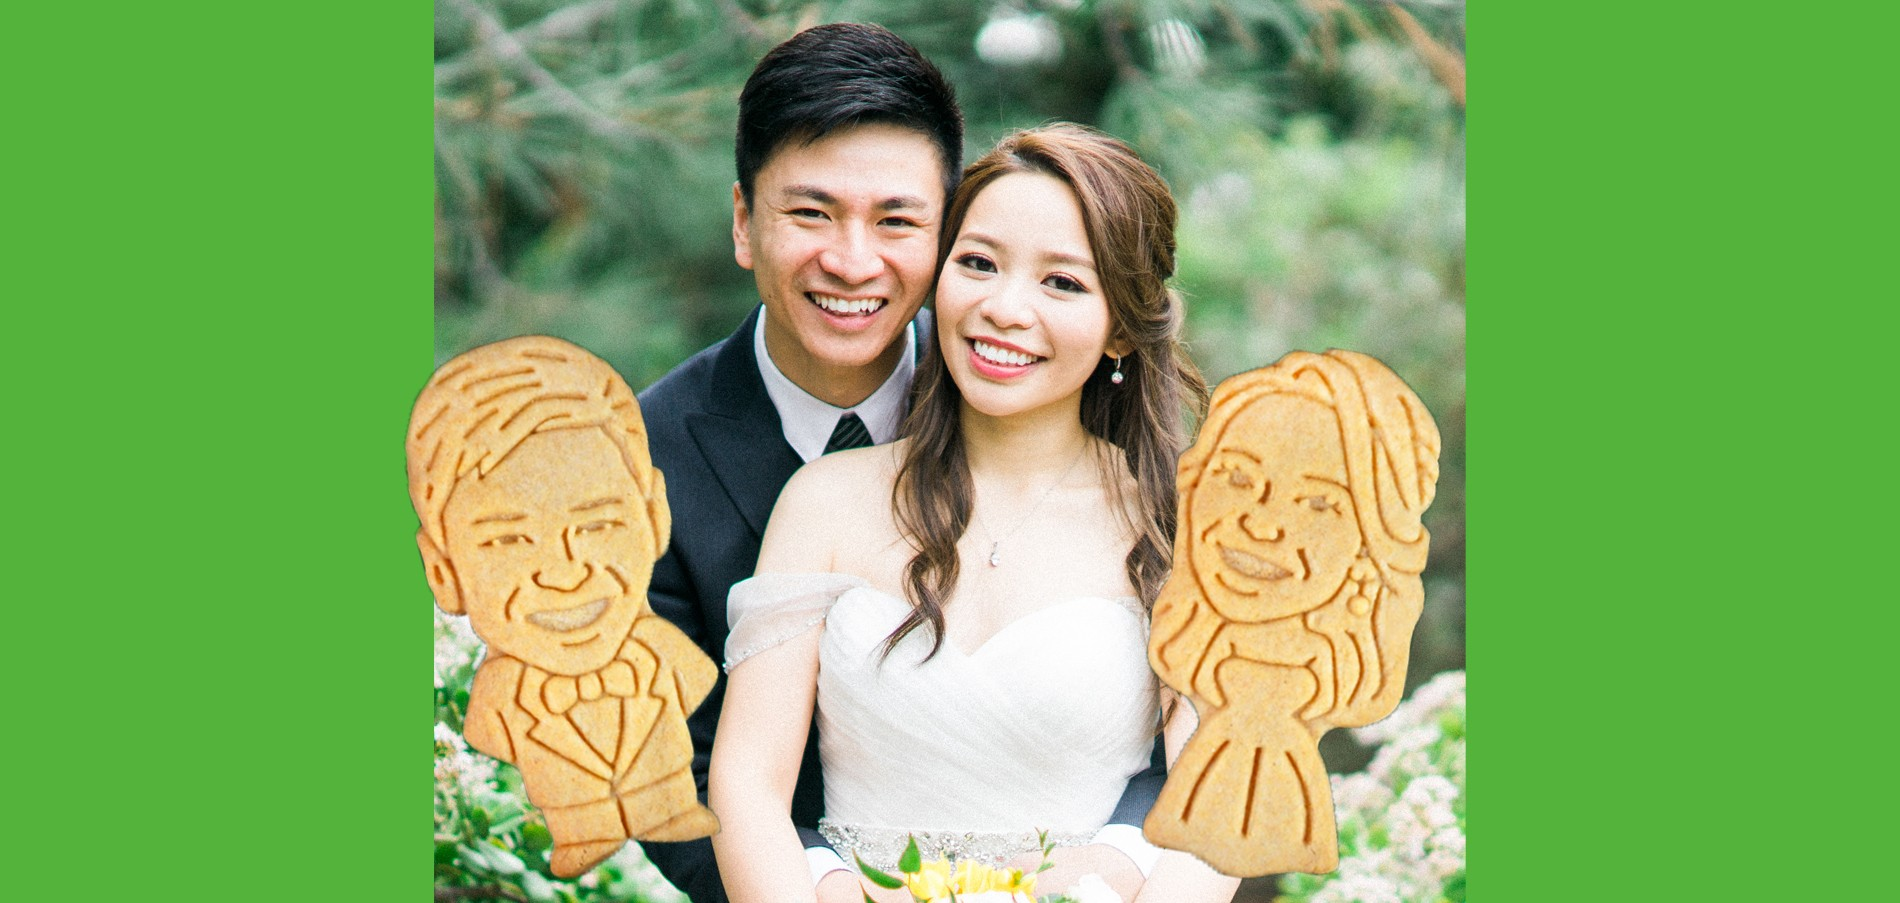 Custom Wedding coookies